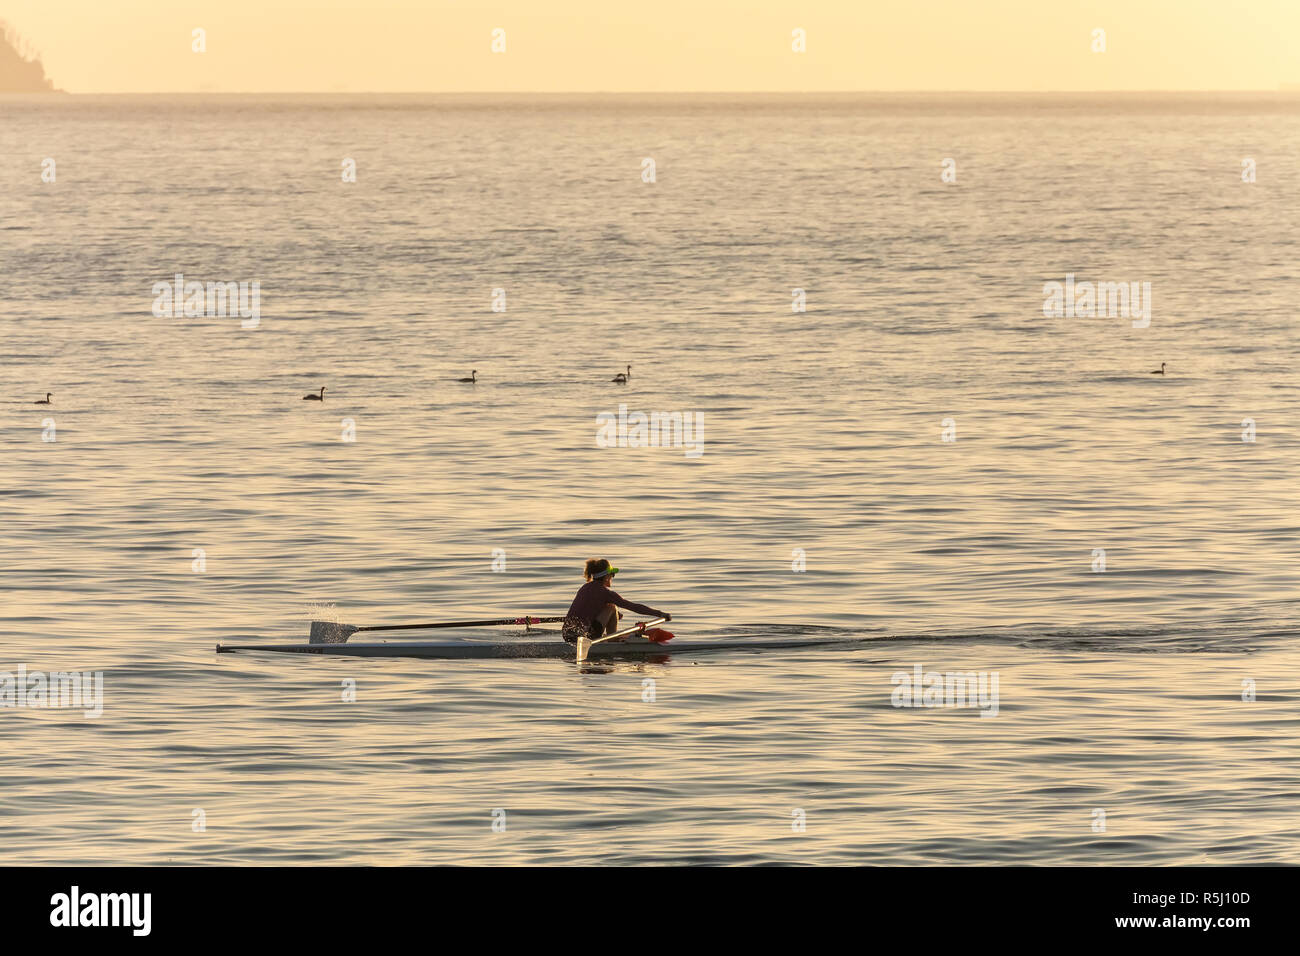 Woman is kayaking in San Francisco Bay at dawn, California, United States. - Stock Image